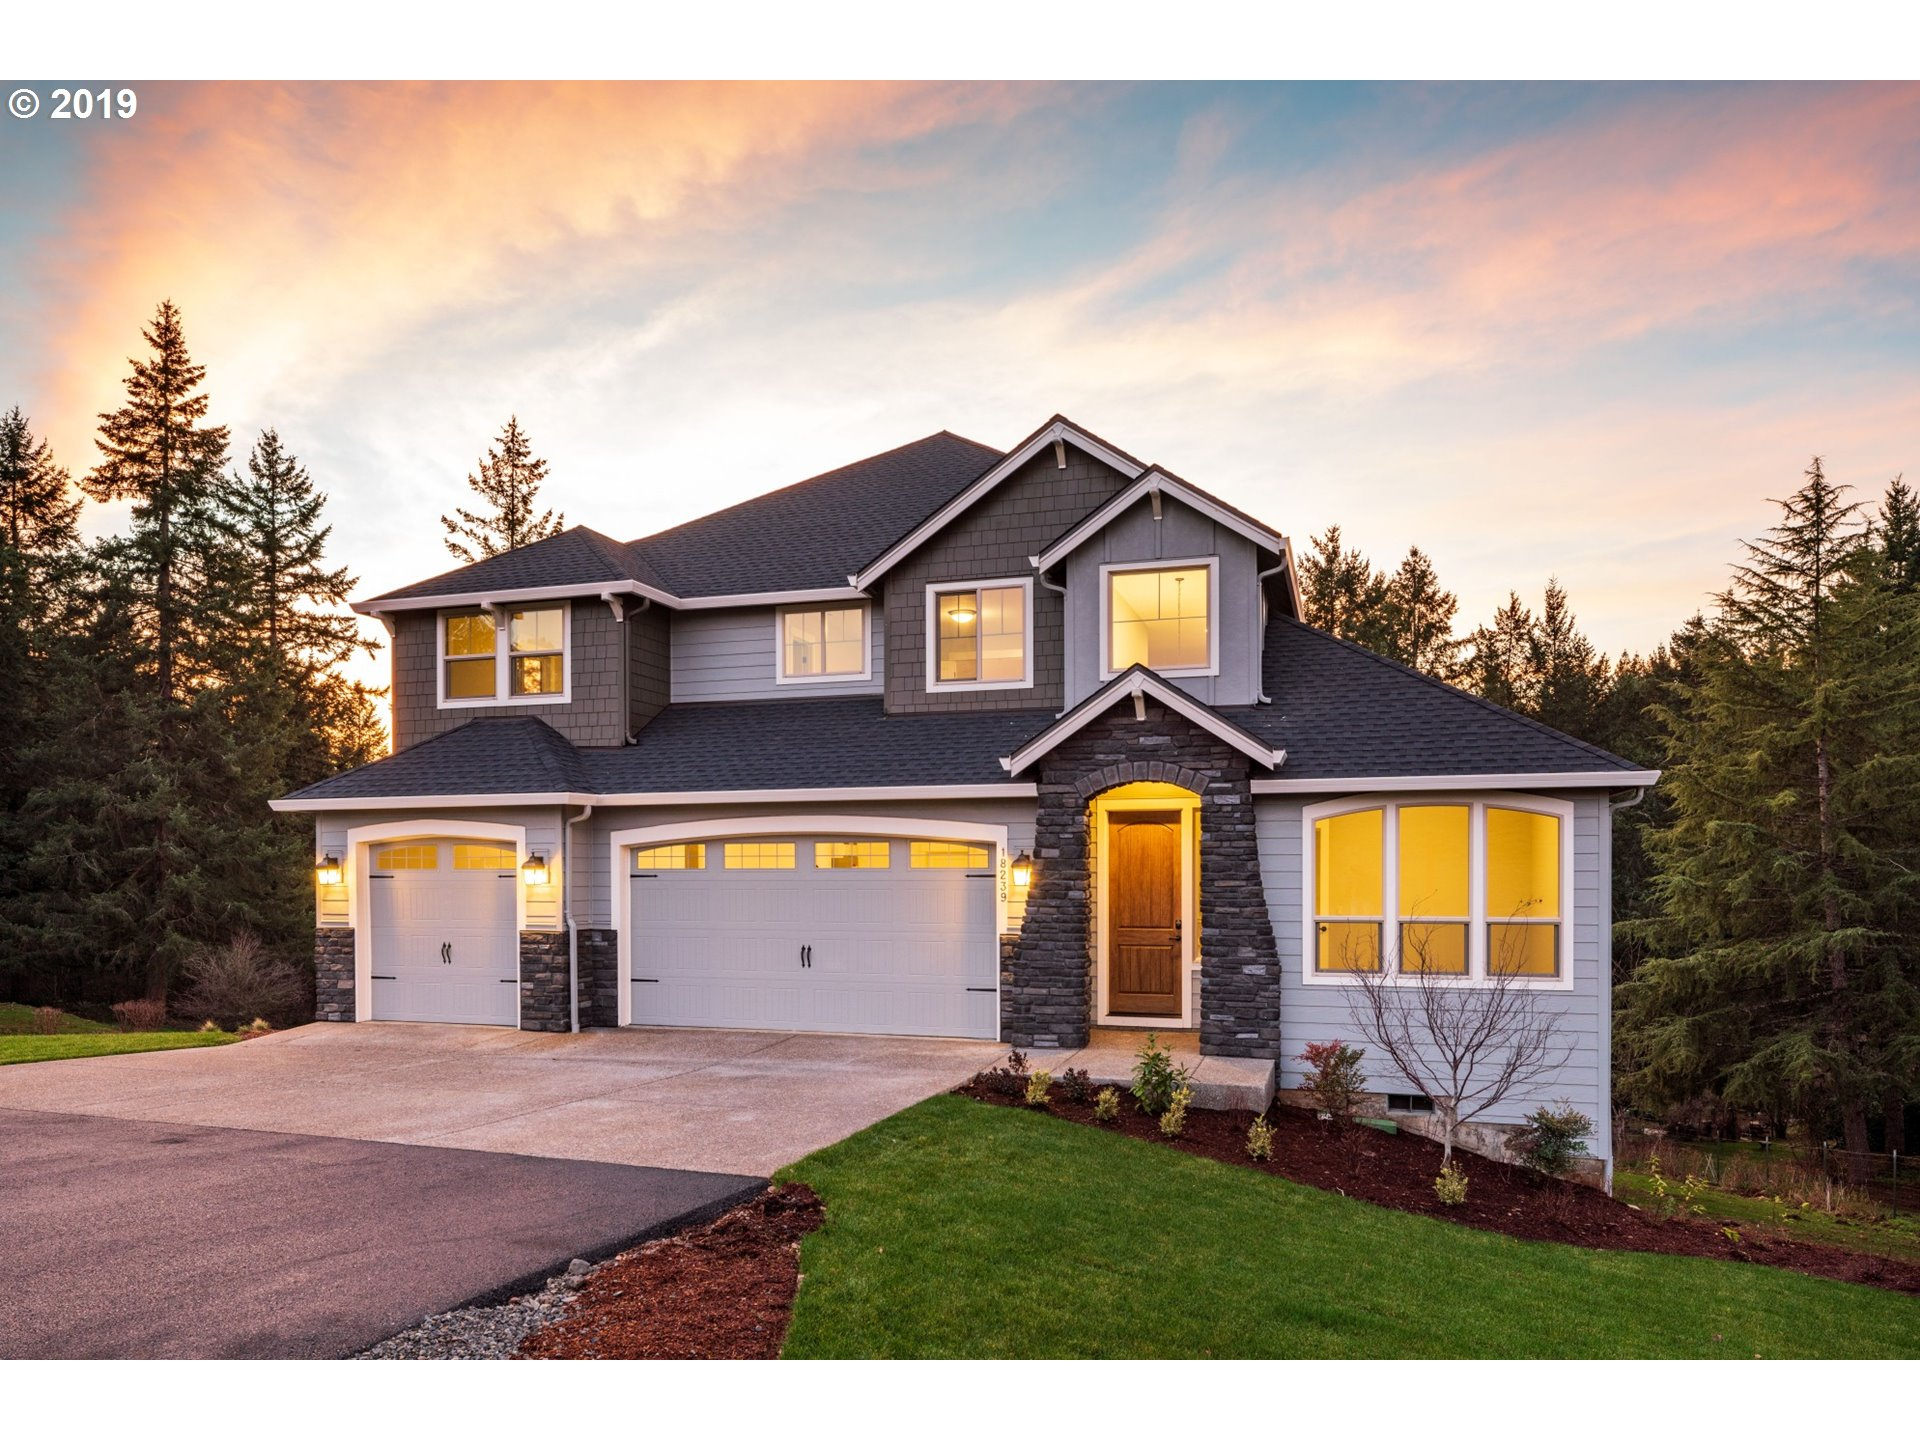 18239 S GRASLE RD, Oregon City OR 97045